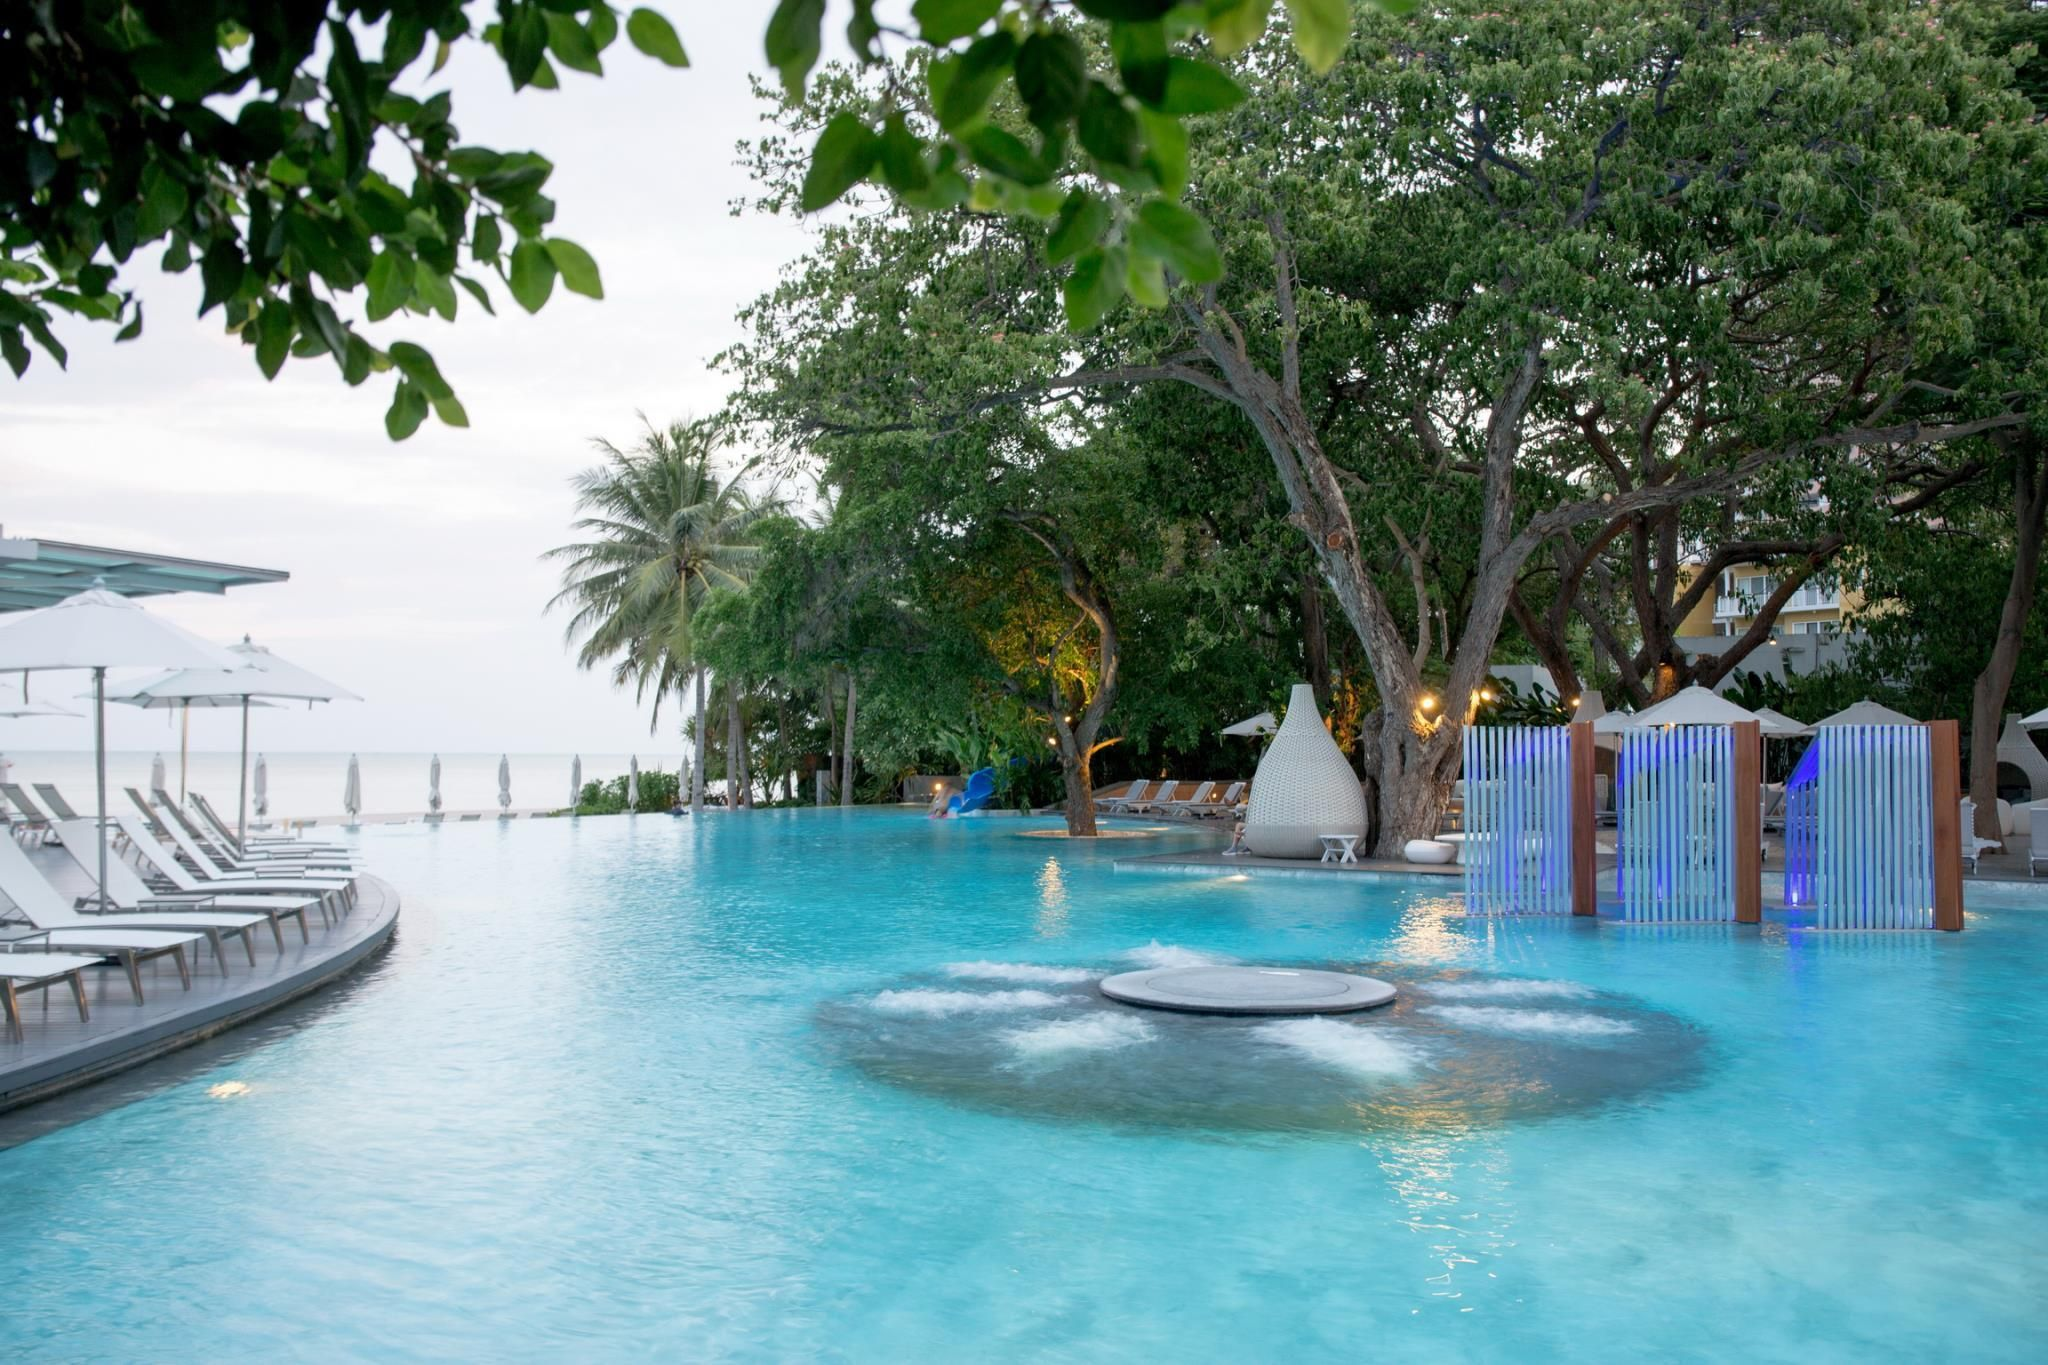 Veranda Resort and Spa Hua Hin Cha Am - Top 10 best resorts in Thailand